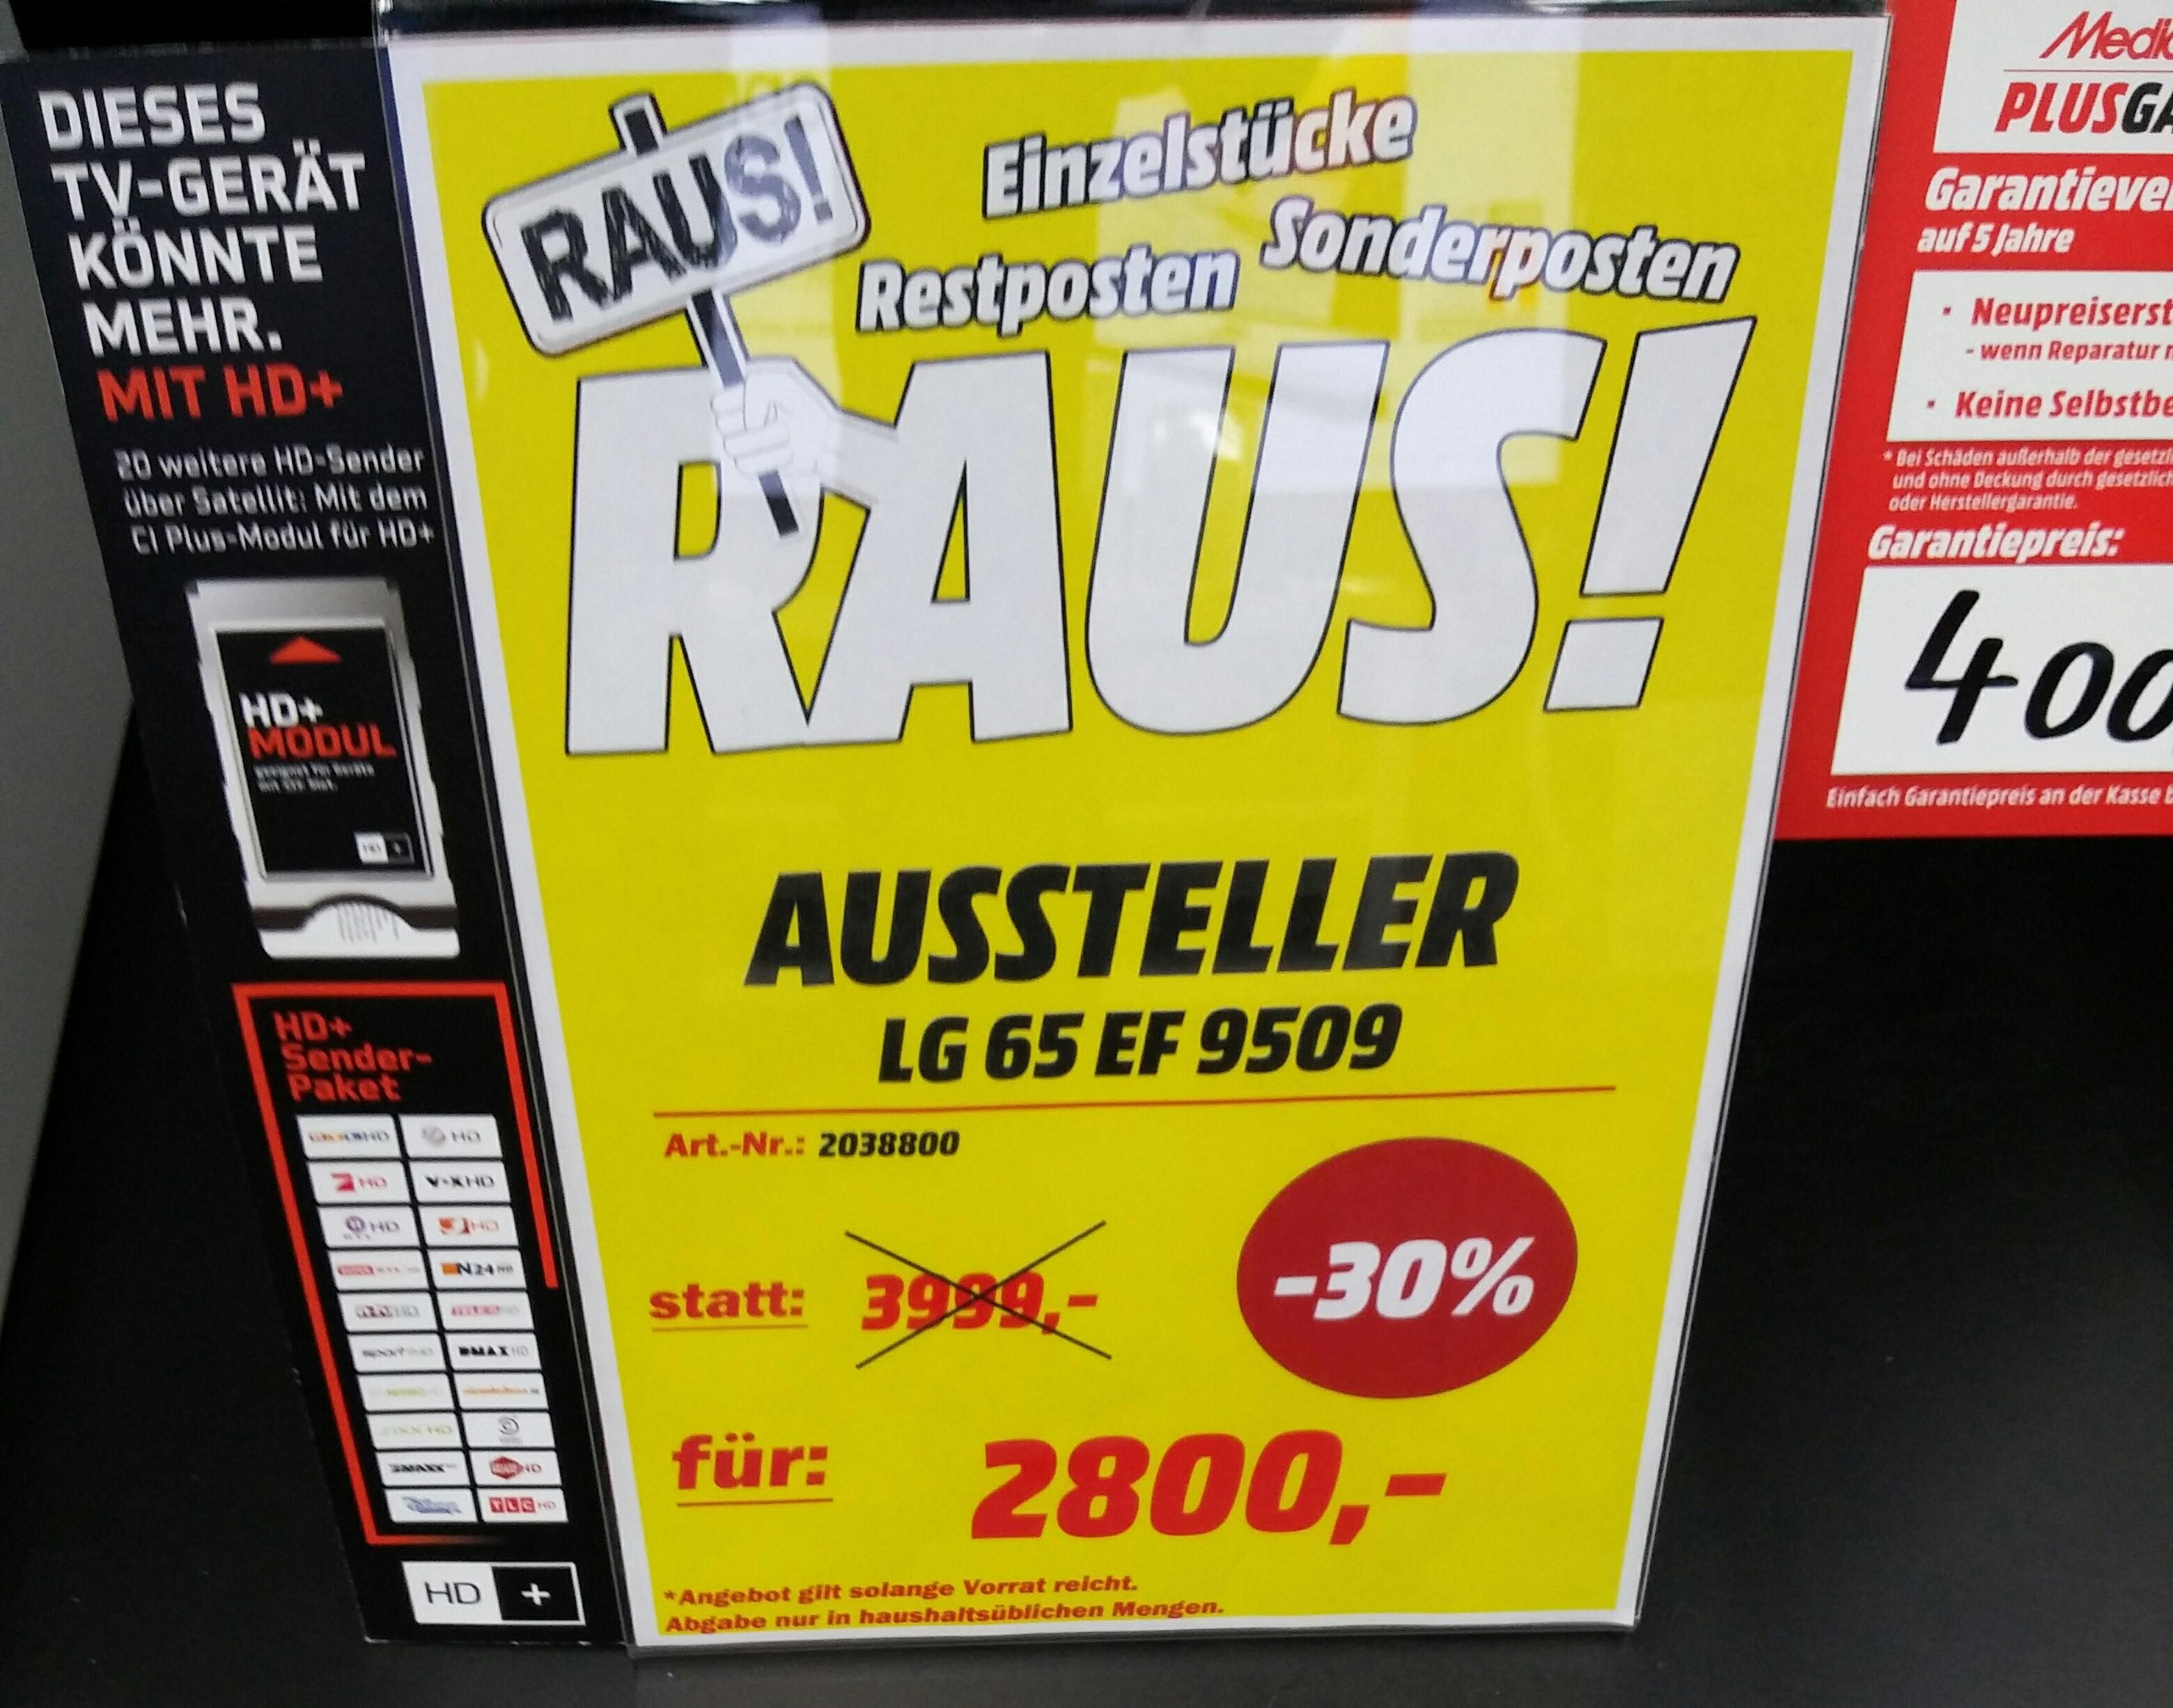 Mediamarkt Riesa (Lokal) LG 65EF9509 Aussteller